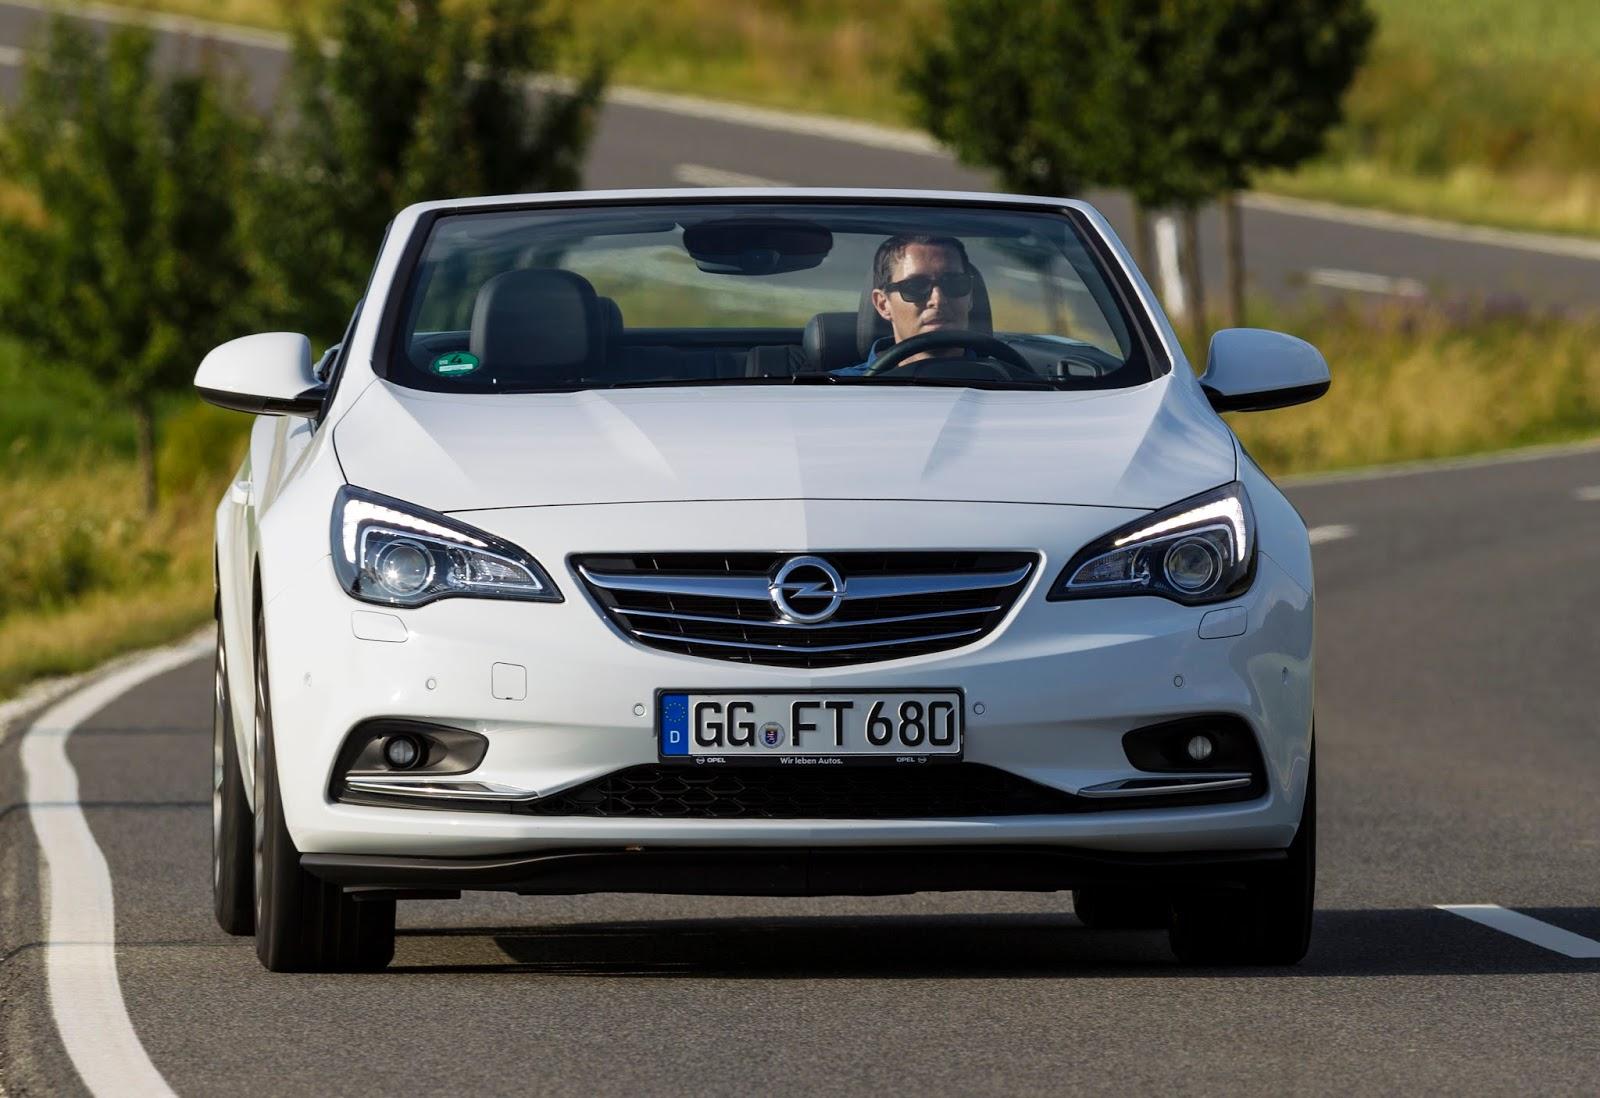 Opel Rallye Hessen Th25C325BCringen 287403 H Πλούσια Κληρονομιά των Opel Cabrio cabrio, Opel, Opel 8/25 hp, Opel Cascada, Opel Olympia, Opel Record, Opel Super 6